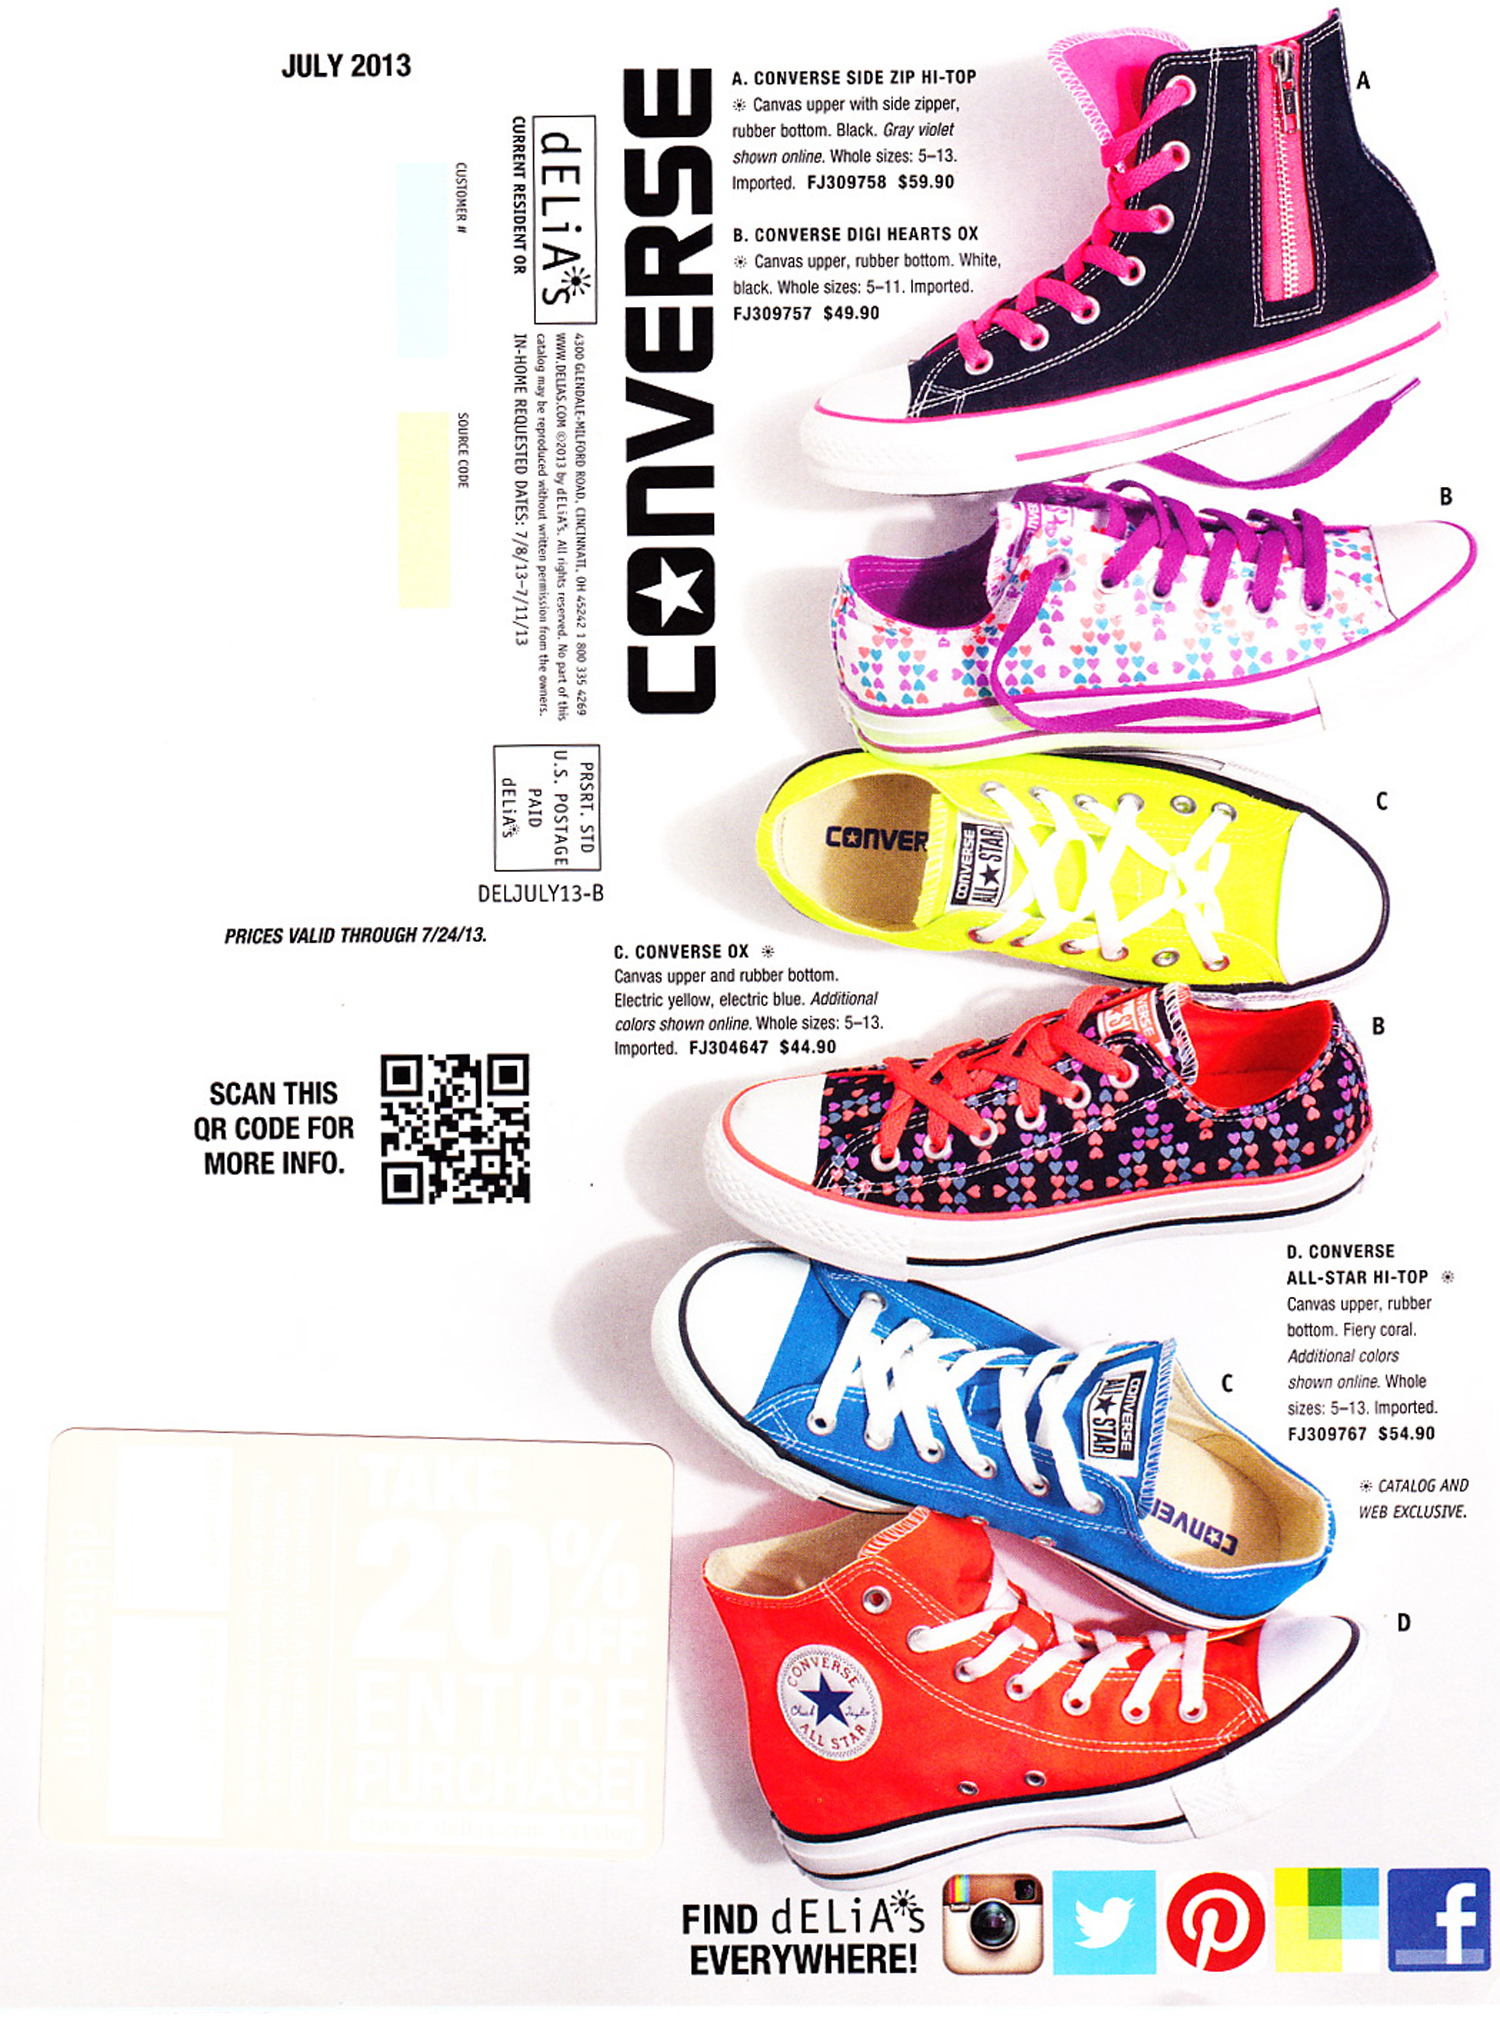 converse2.jpg